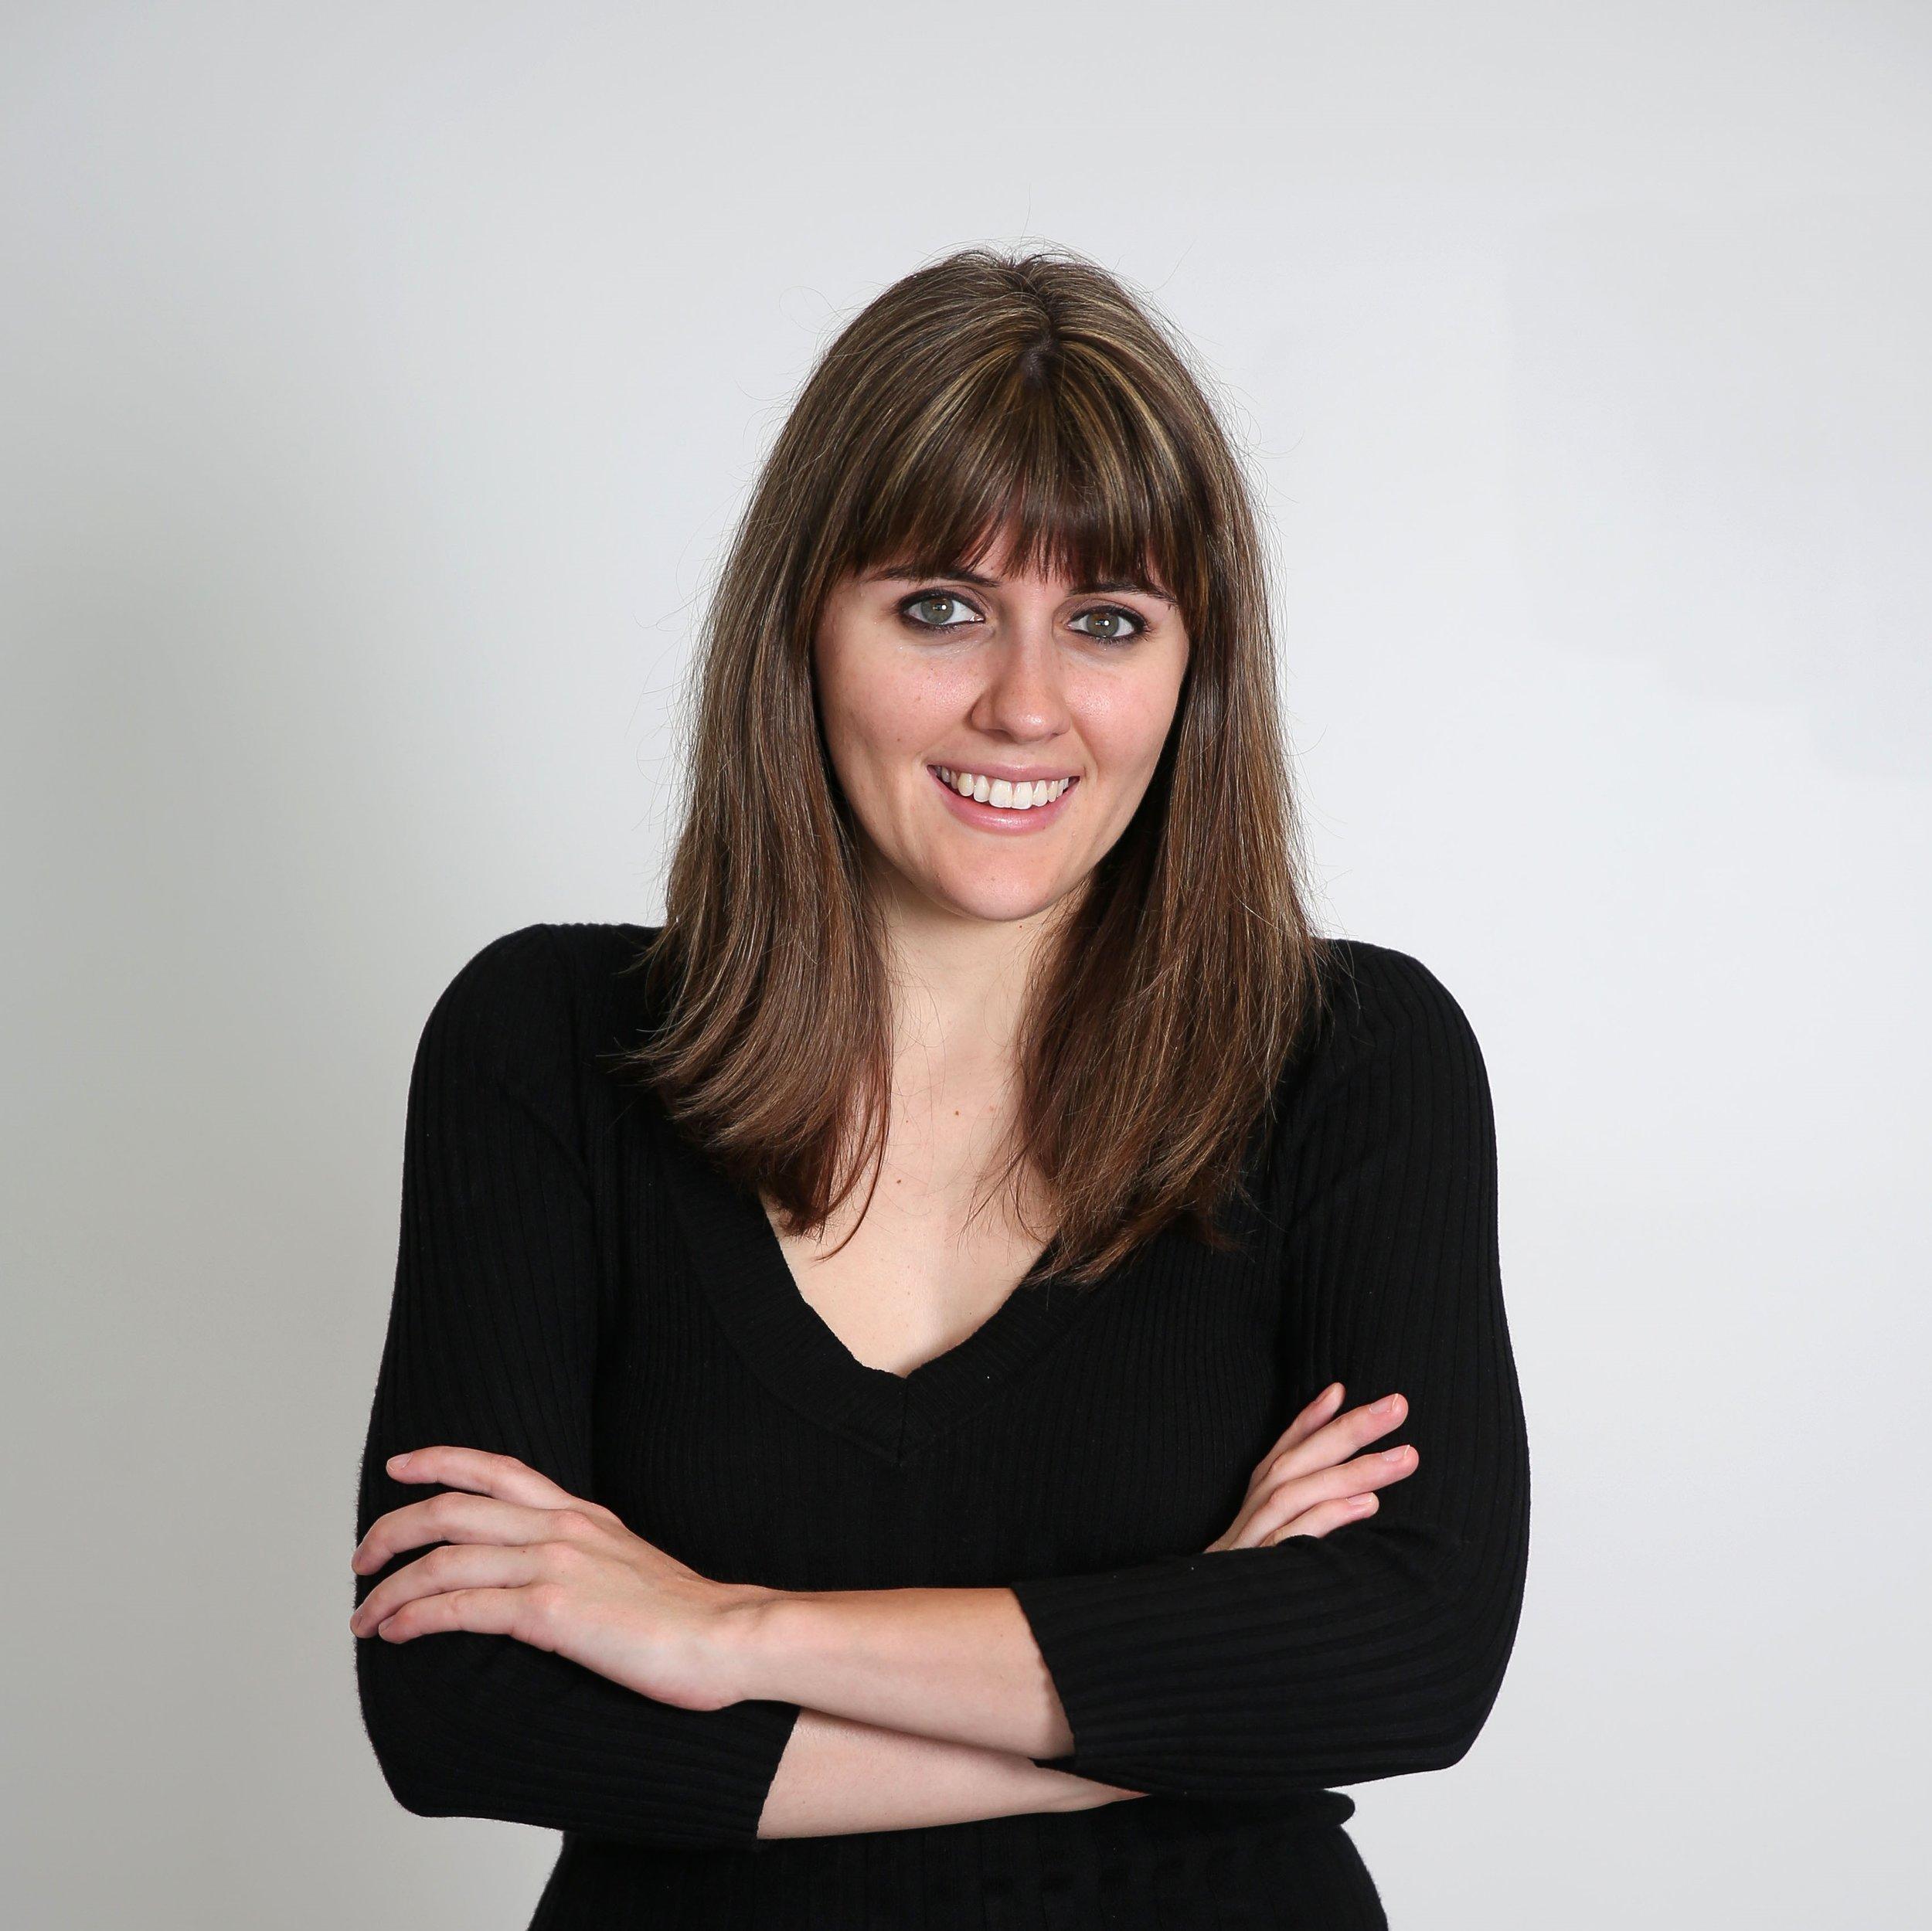 Ashley-Fahey-Charlotte-Business-Journal-NTRLXSUMMIT-New-Trends-In-Real-Estate-And-Luxury-Summit.JPG